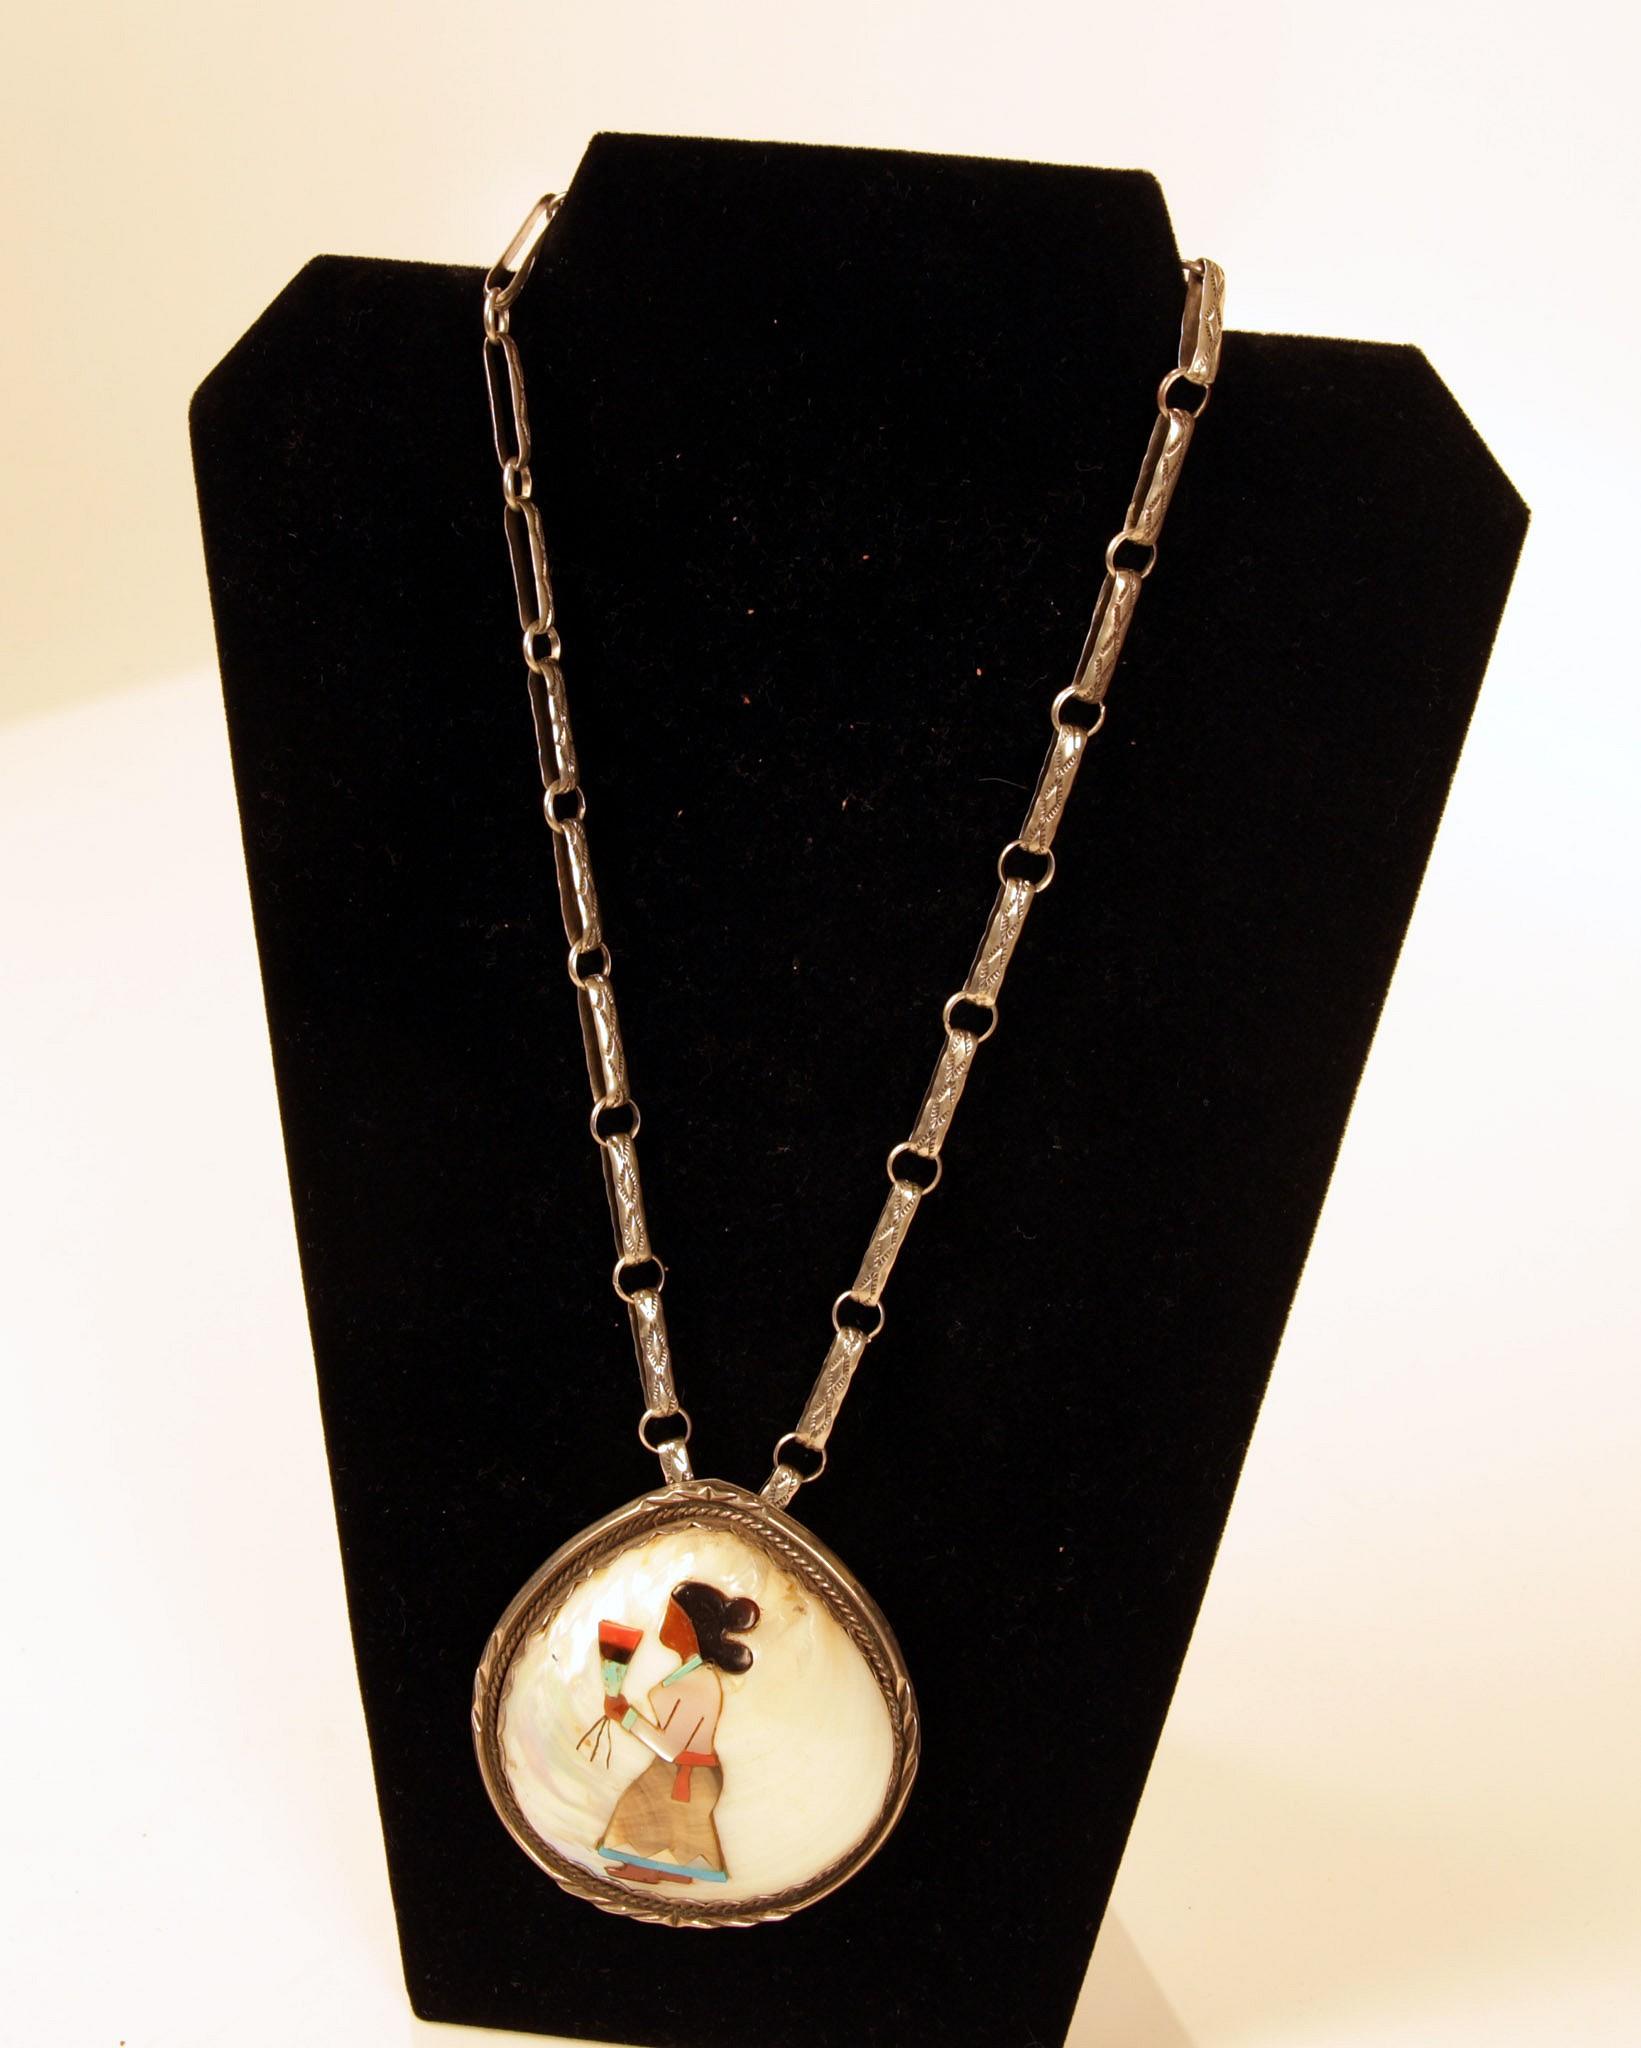 Exhibition Shell Necklace : March  exquisite fetish necklace len